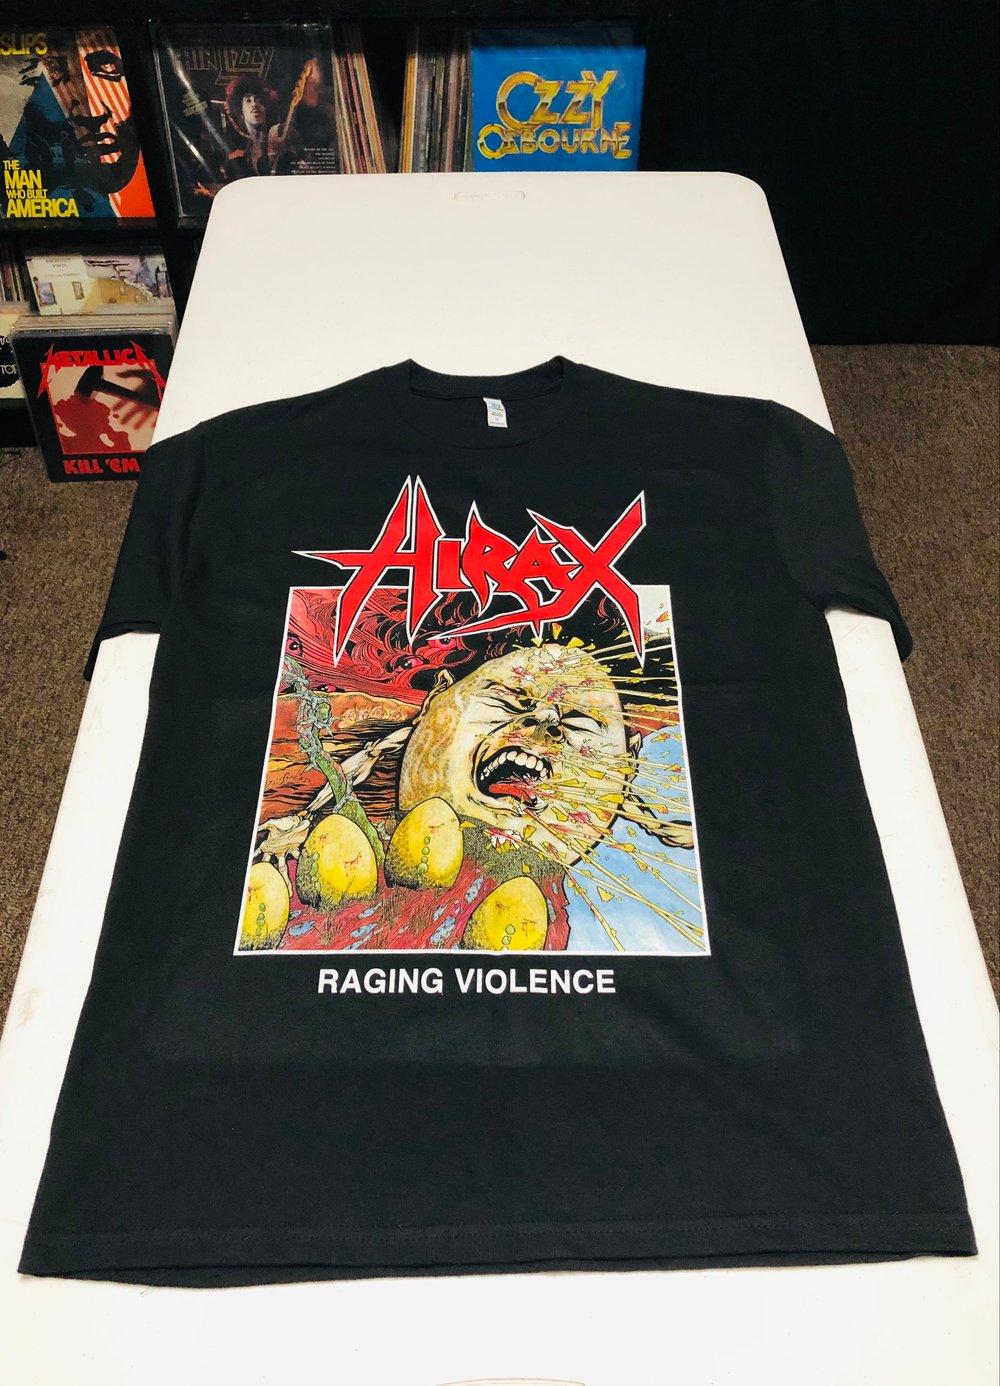 HIRAX Raging Violence T - Shirt U.S.A.